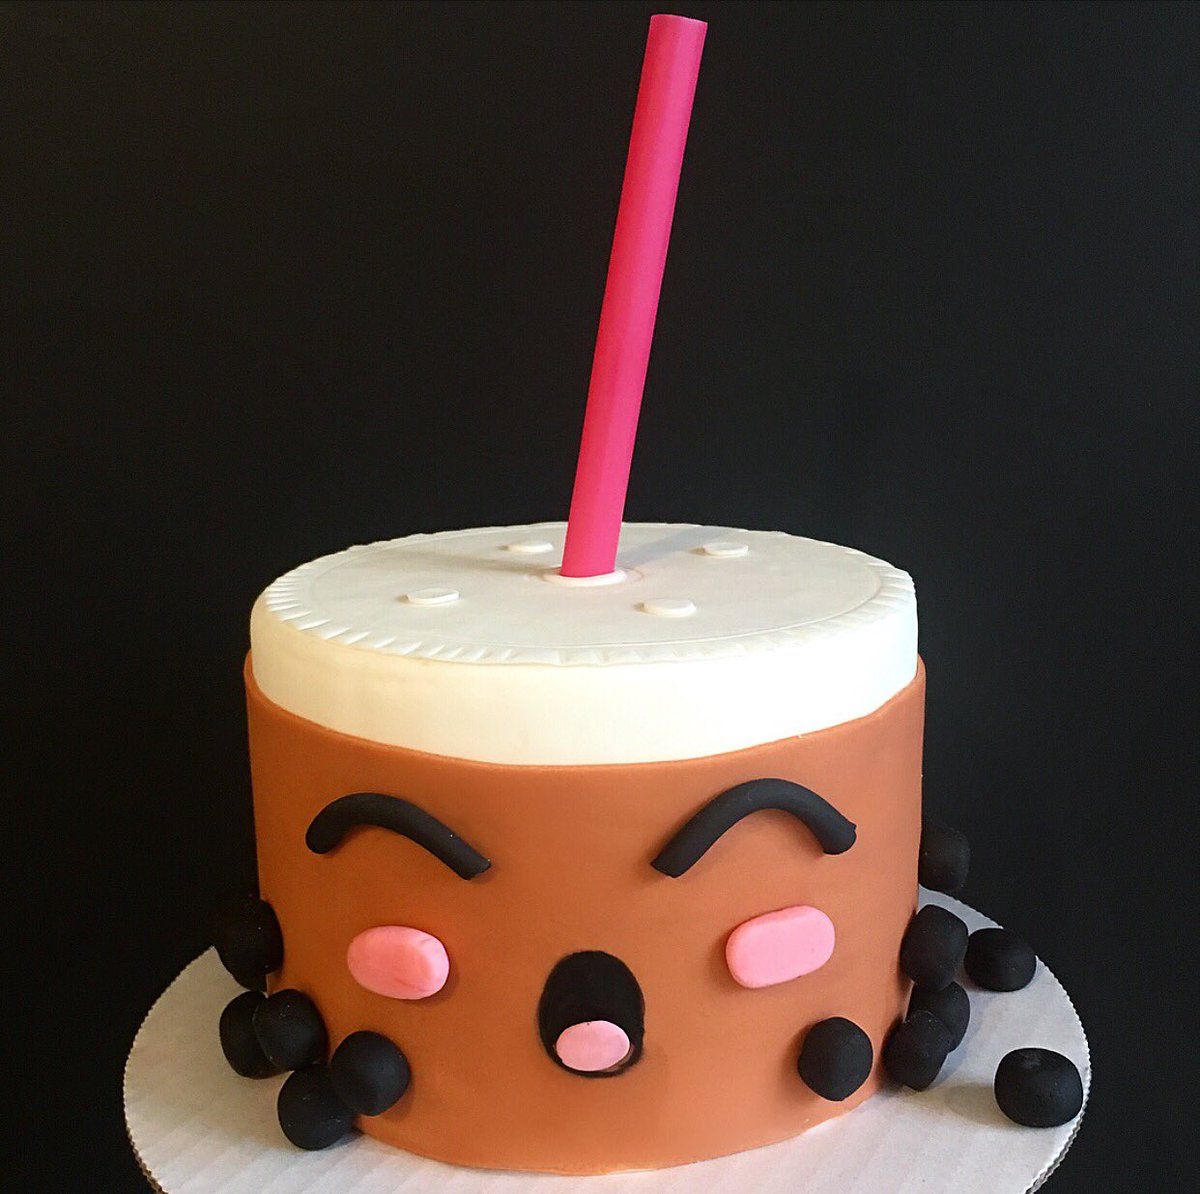 Duff S Cakemix On Twitter This Cake Is Boba Tea Riffic